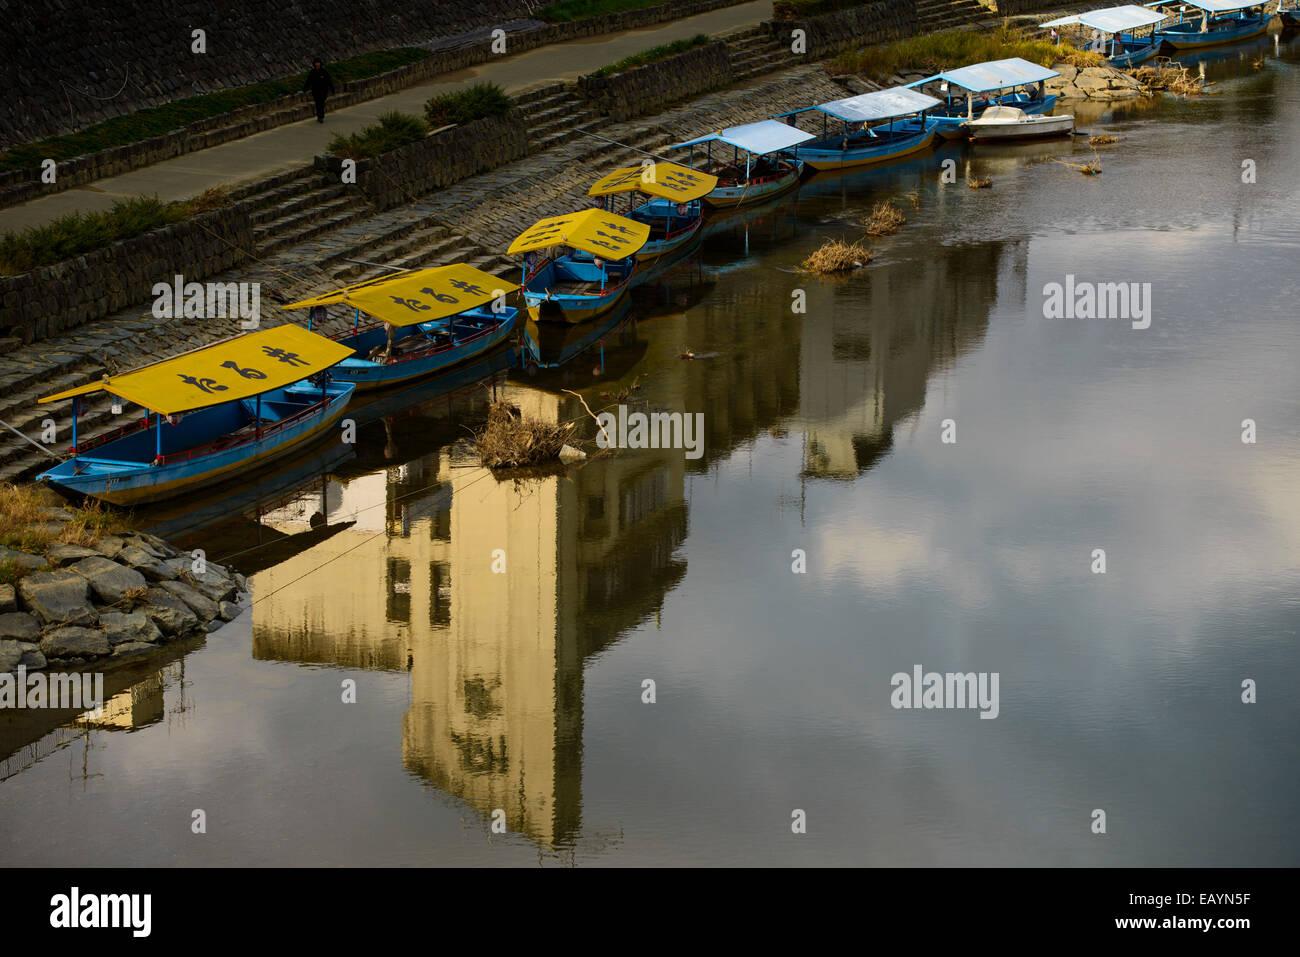 River boats in Kumamoto, Kyushu, Japan - Stock Image